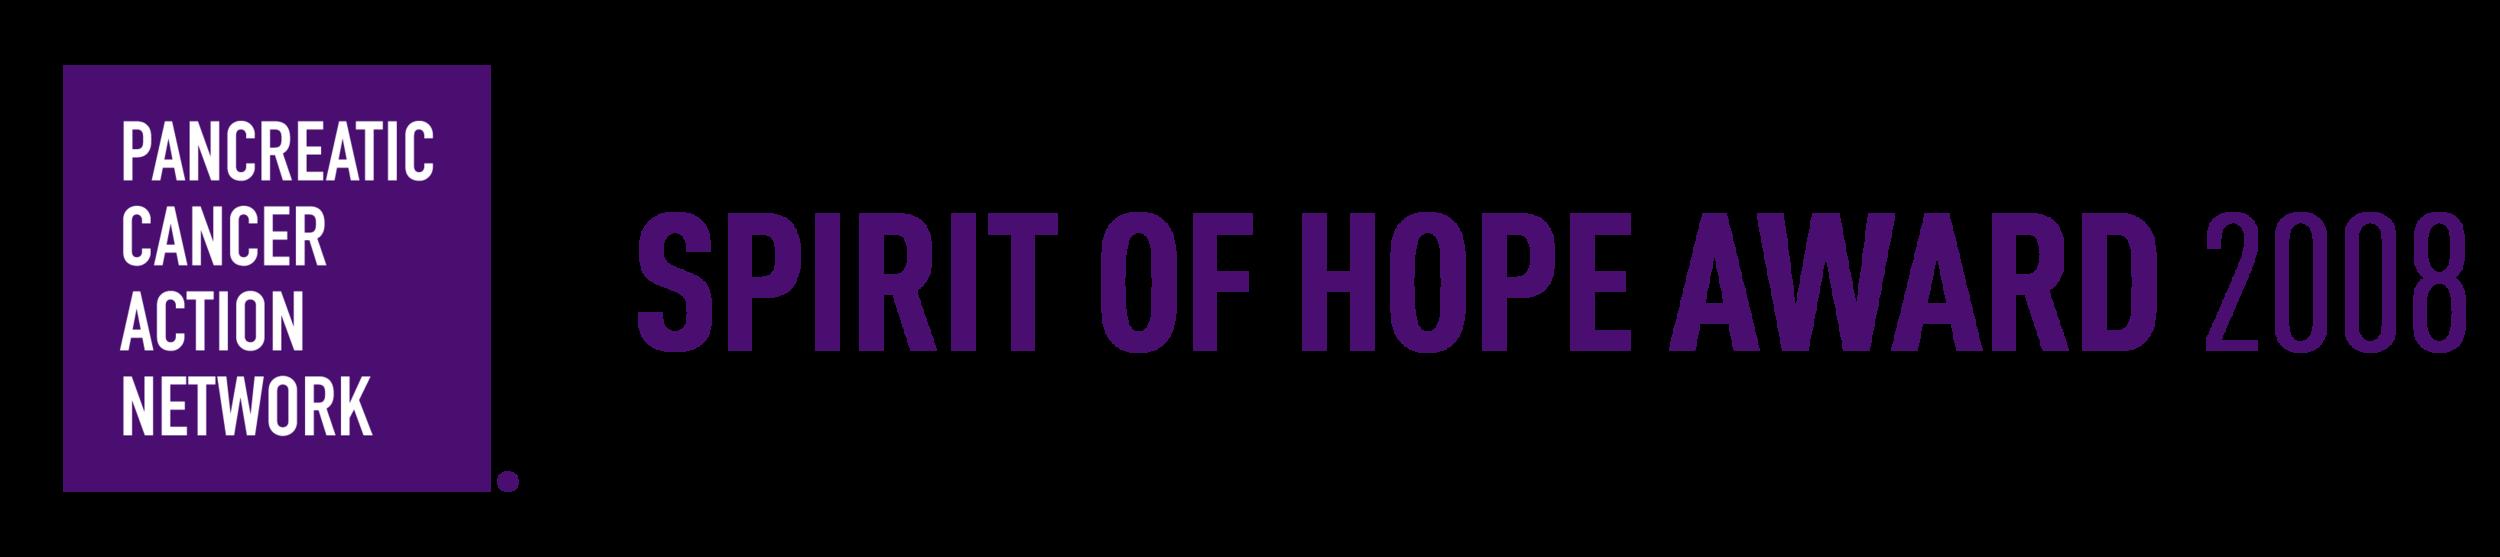 Pancreatic Cancer Survivor Laurie MacCaskill Receives 2008 Spirit of Hope Award